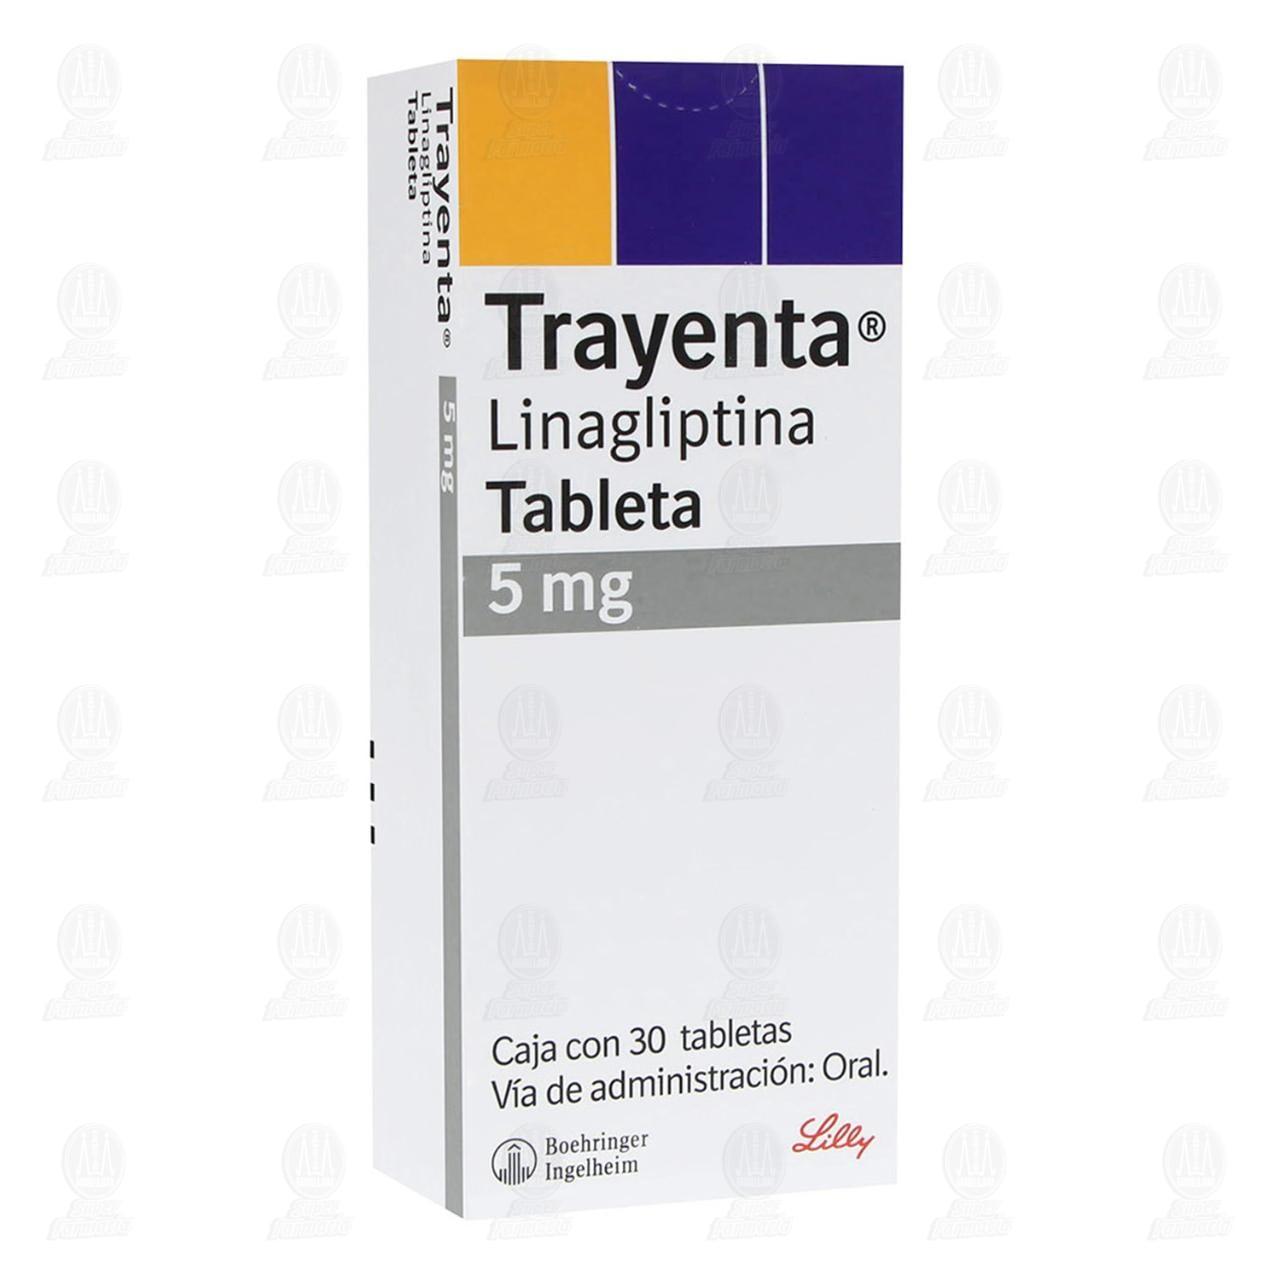 Trayenta 5mg 30 Tabletas